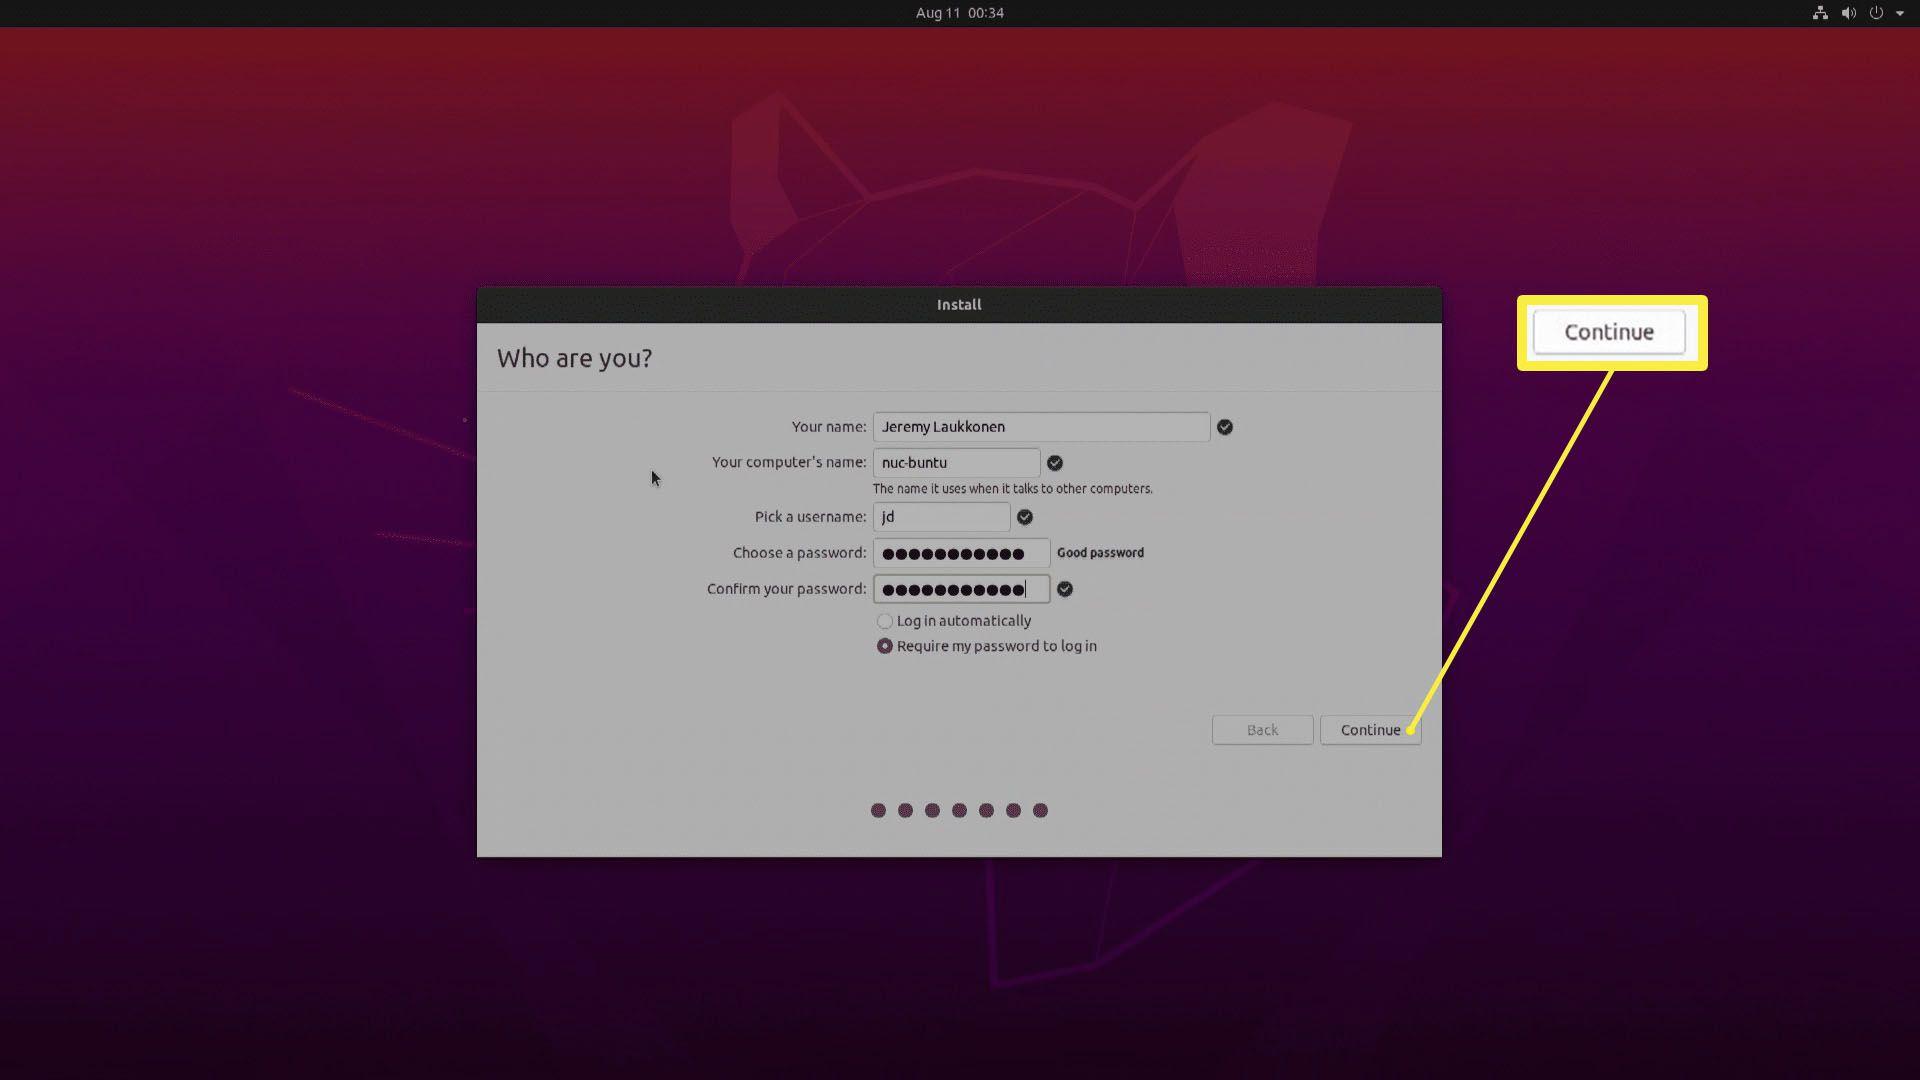 A screenshot of Ubuntu installation settings.